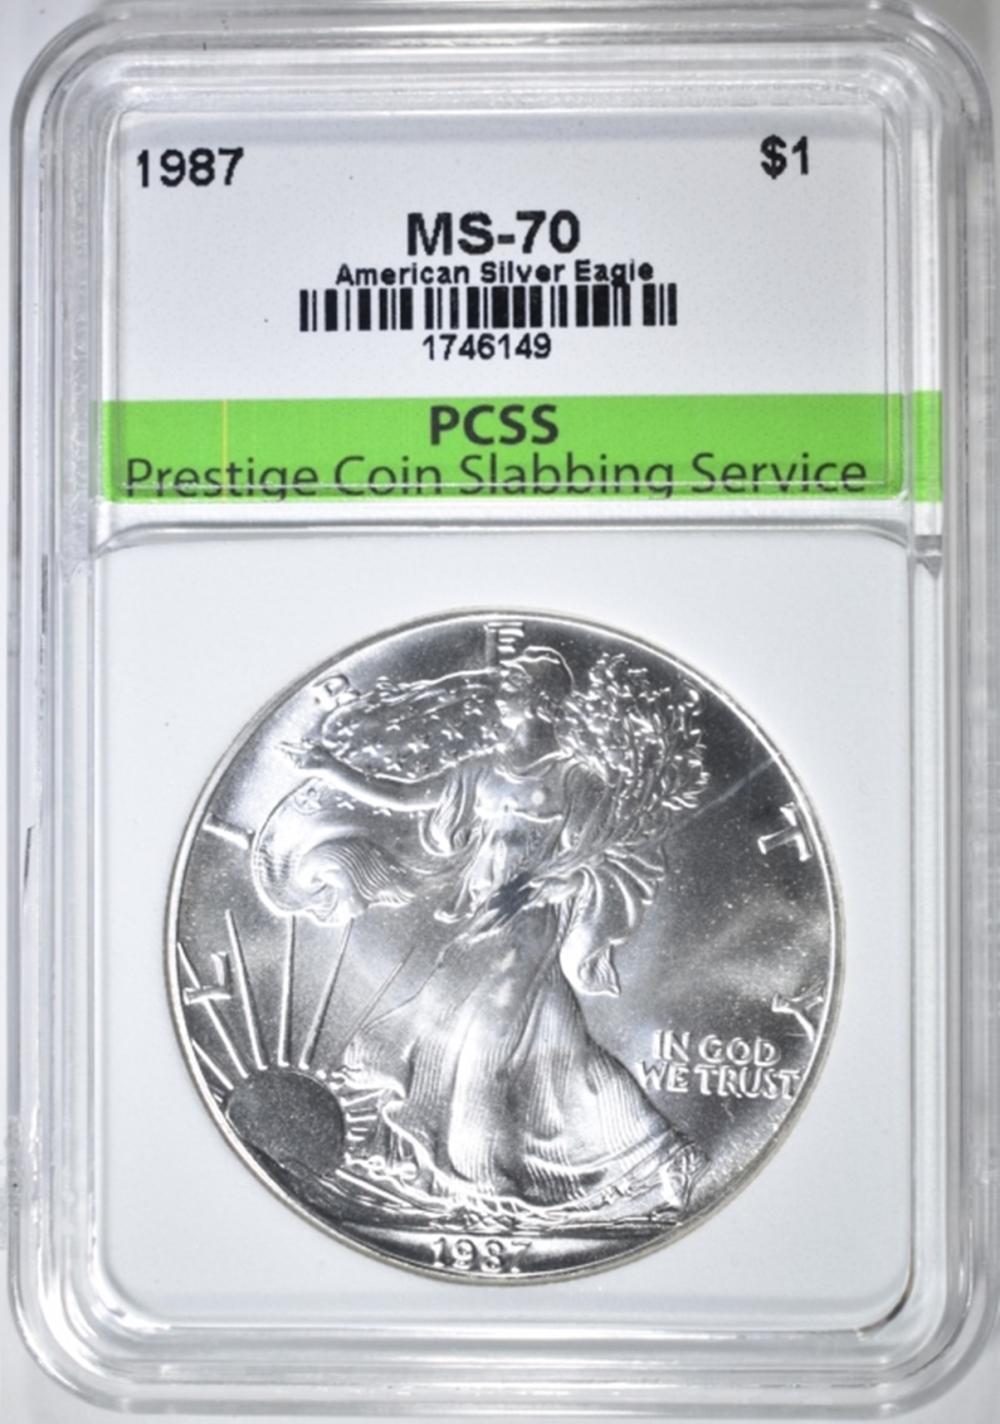 1987 ASE PCSS PERFECT GEM